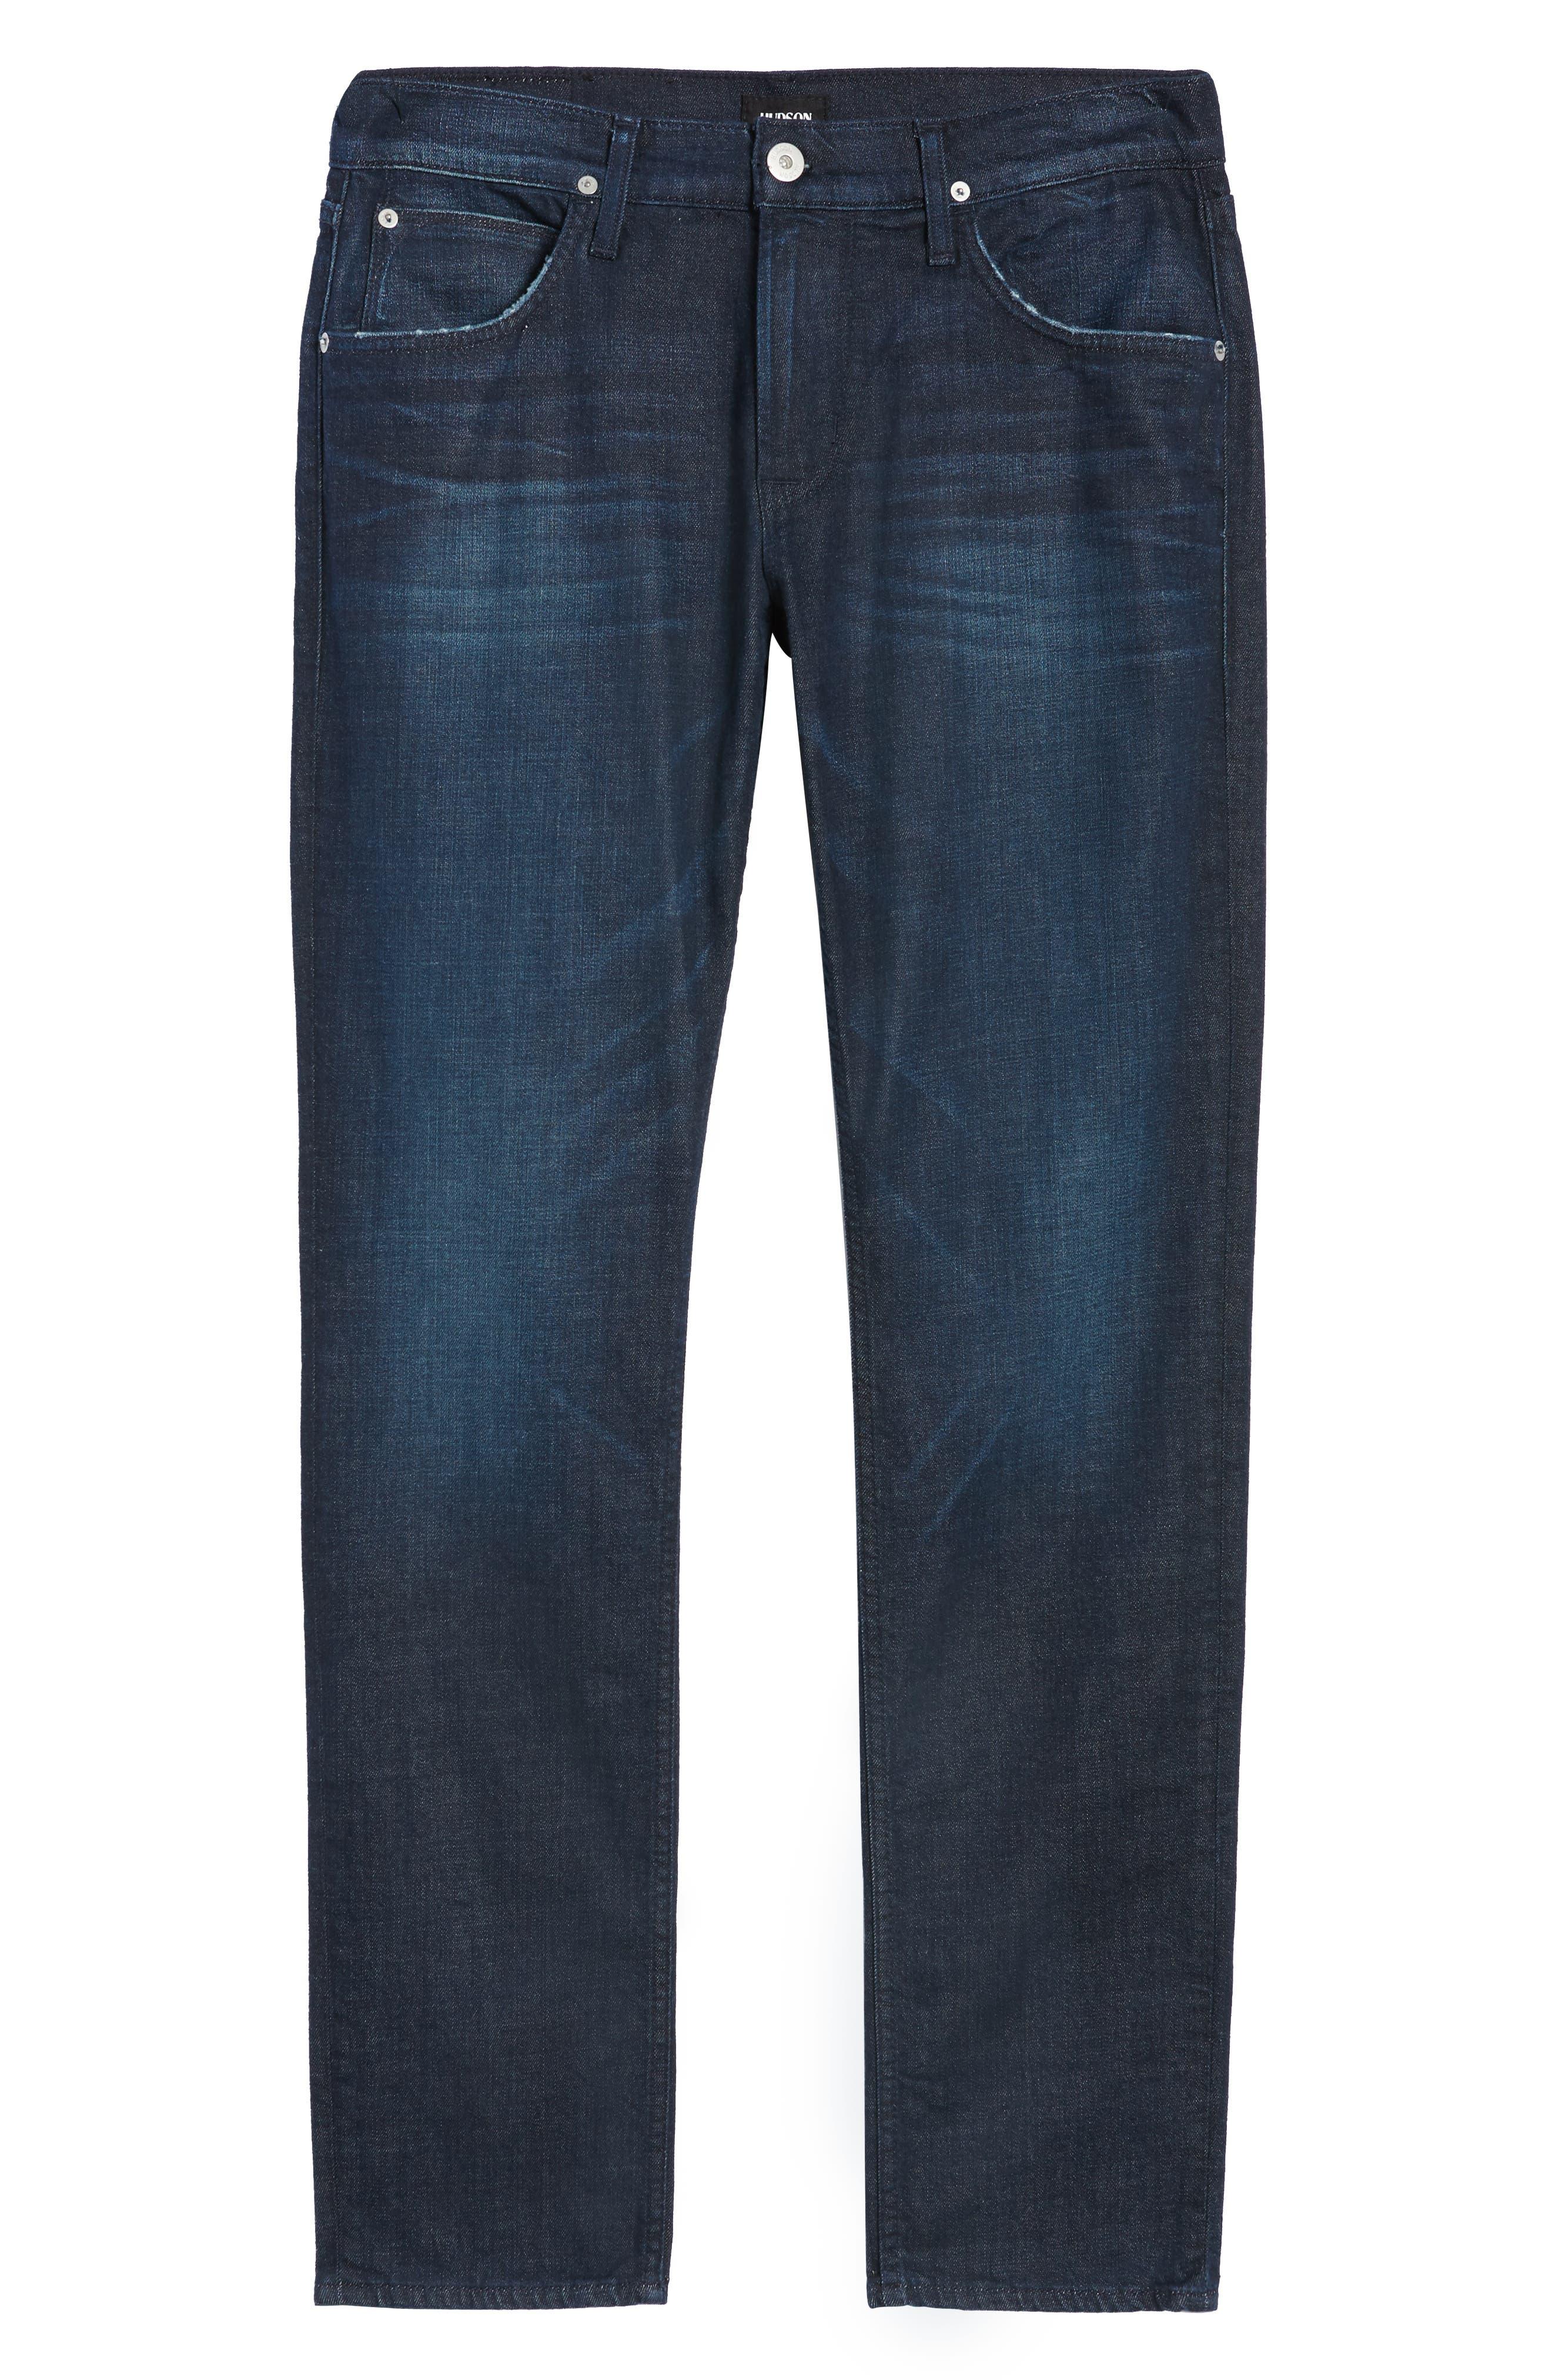 Blake Slim Fit Jeans,                             Alternate thumbnail 6, color,                             BARRY